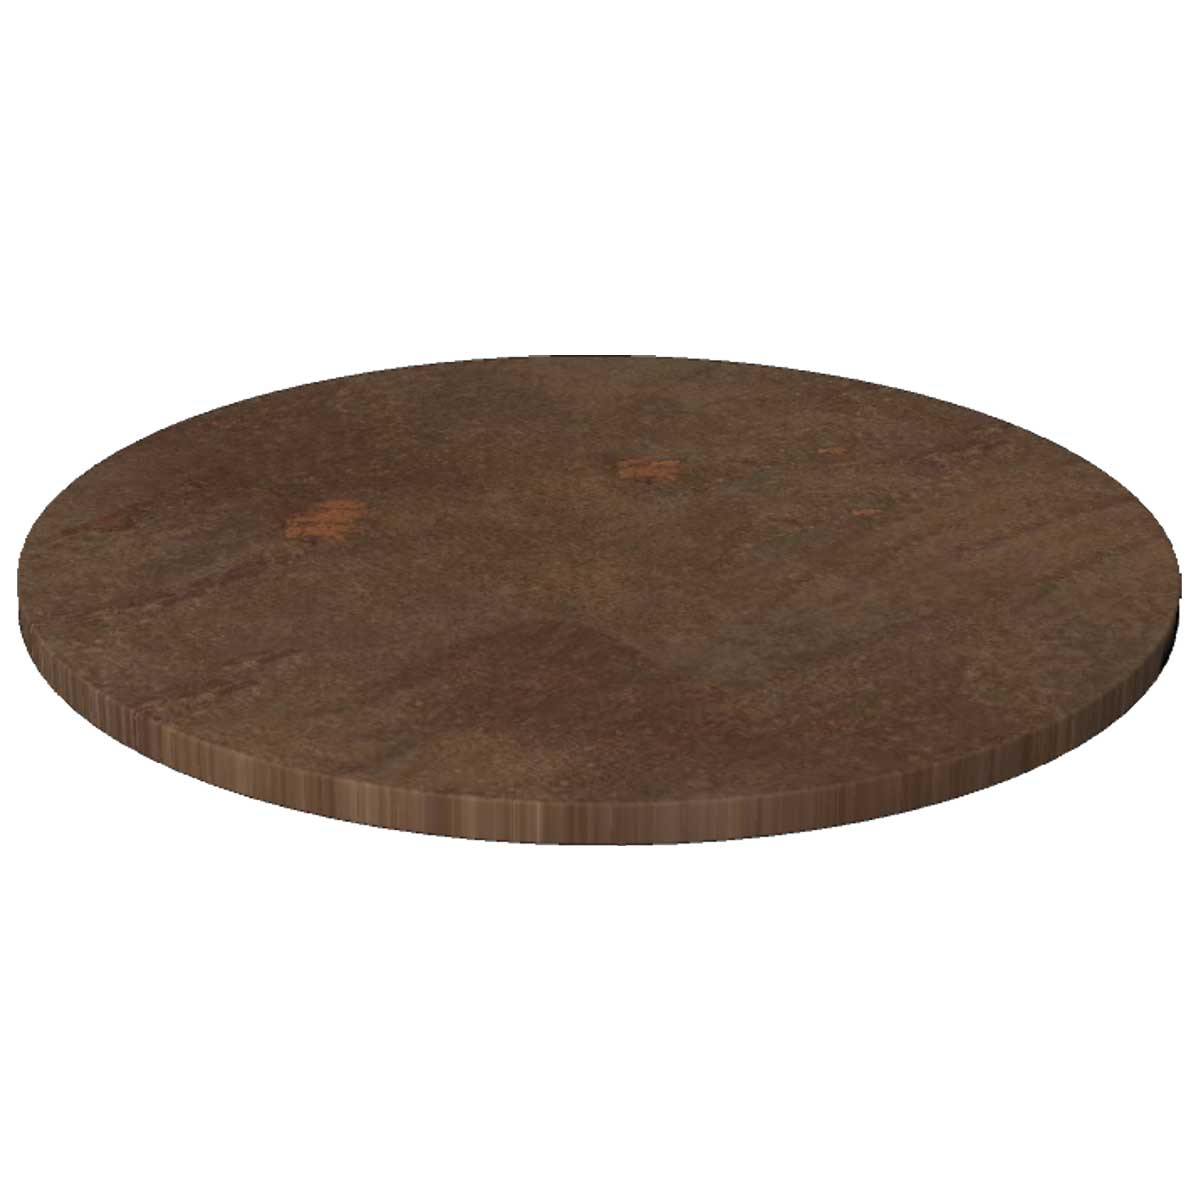 TICAM R60 3276 - https://www.werzalit.com/en/product/table-top-cambium-r-oe60cm-board-thickness-39cm-decor-bonn/